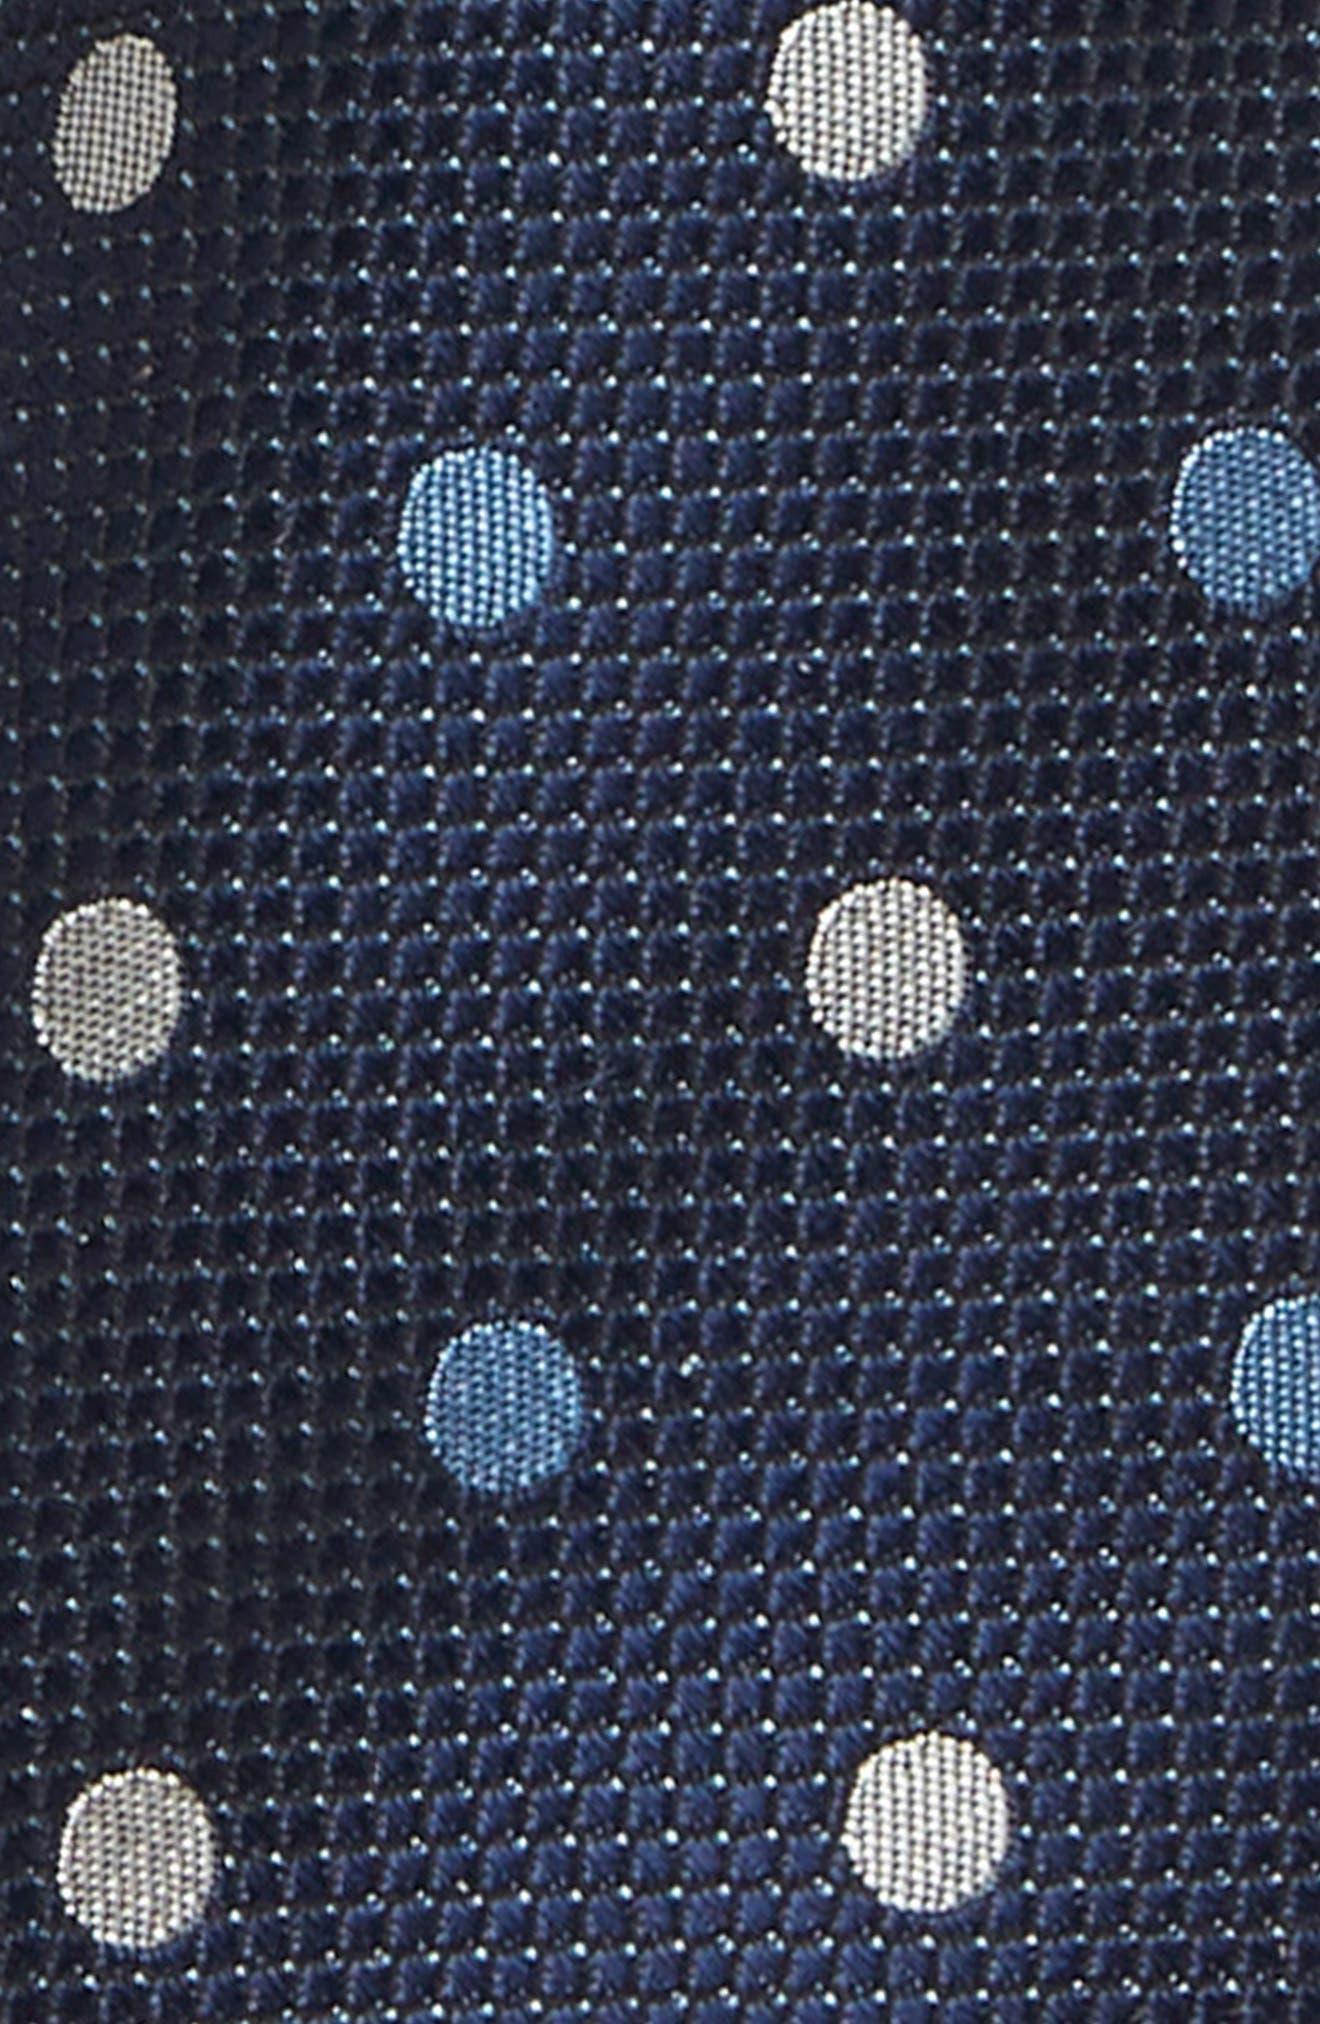 Polka Dot Silk Tie,                             Alternate thumbnail 2, color,                             411